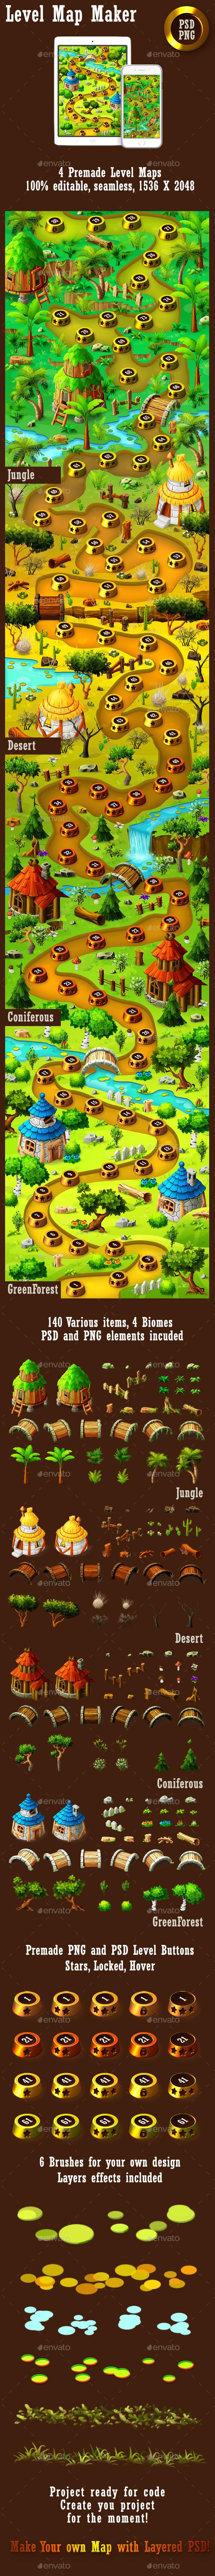 Forest Game Level Map Maker - Backgrounds Game Assets